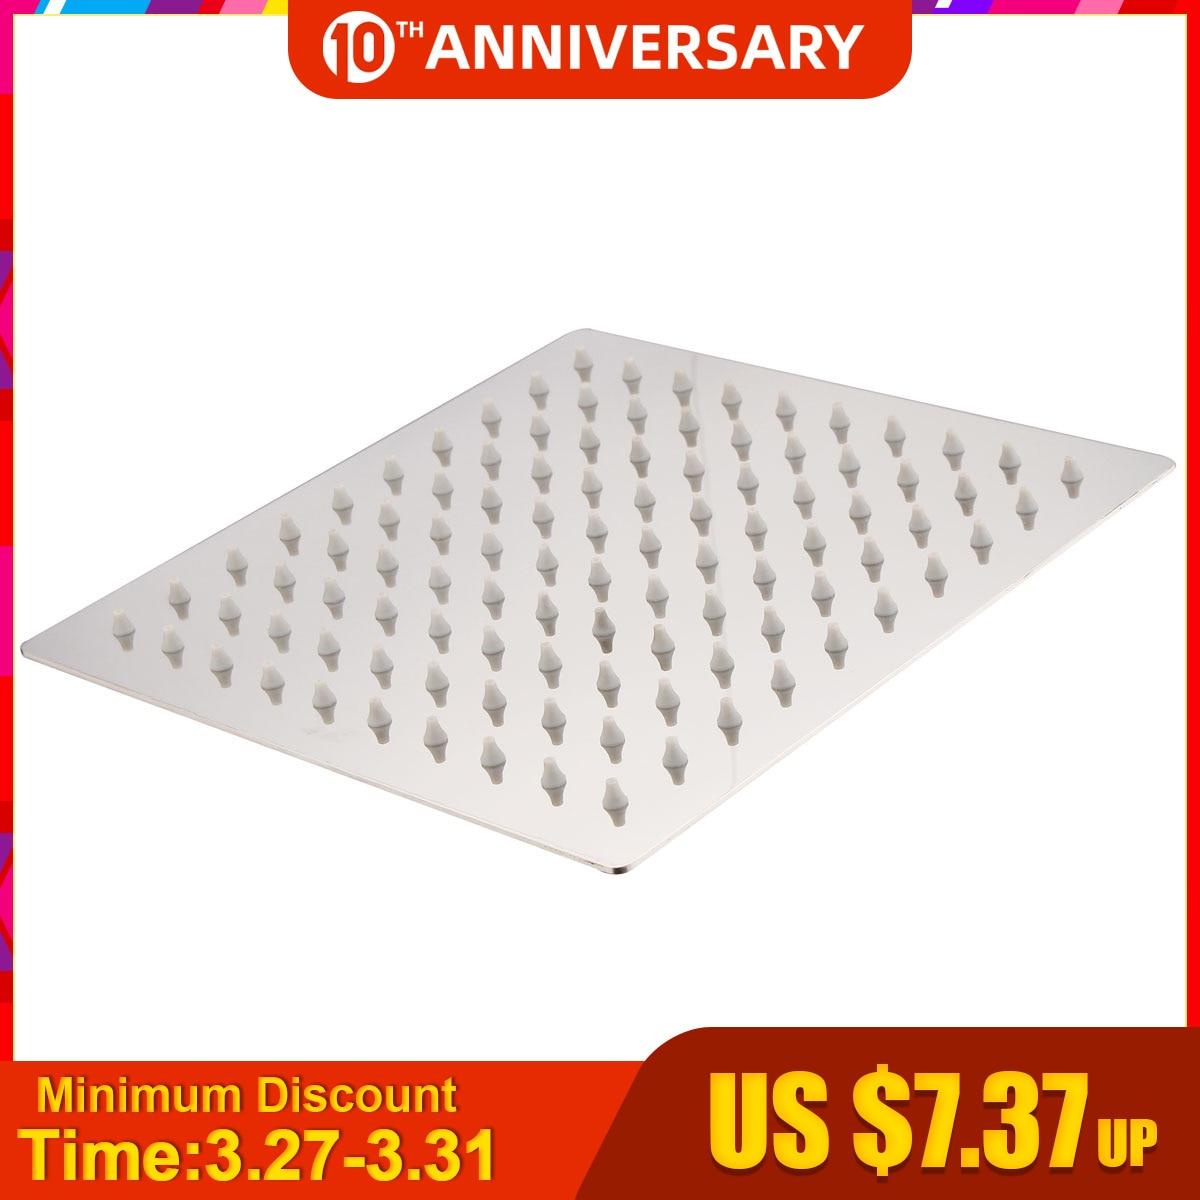 20x20cm 8 Square Stainless Steel Rain Shower Head Rainfall Bathroom Top Sprayer Thin High Pressure